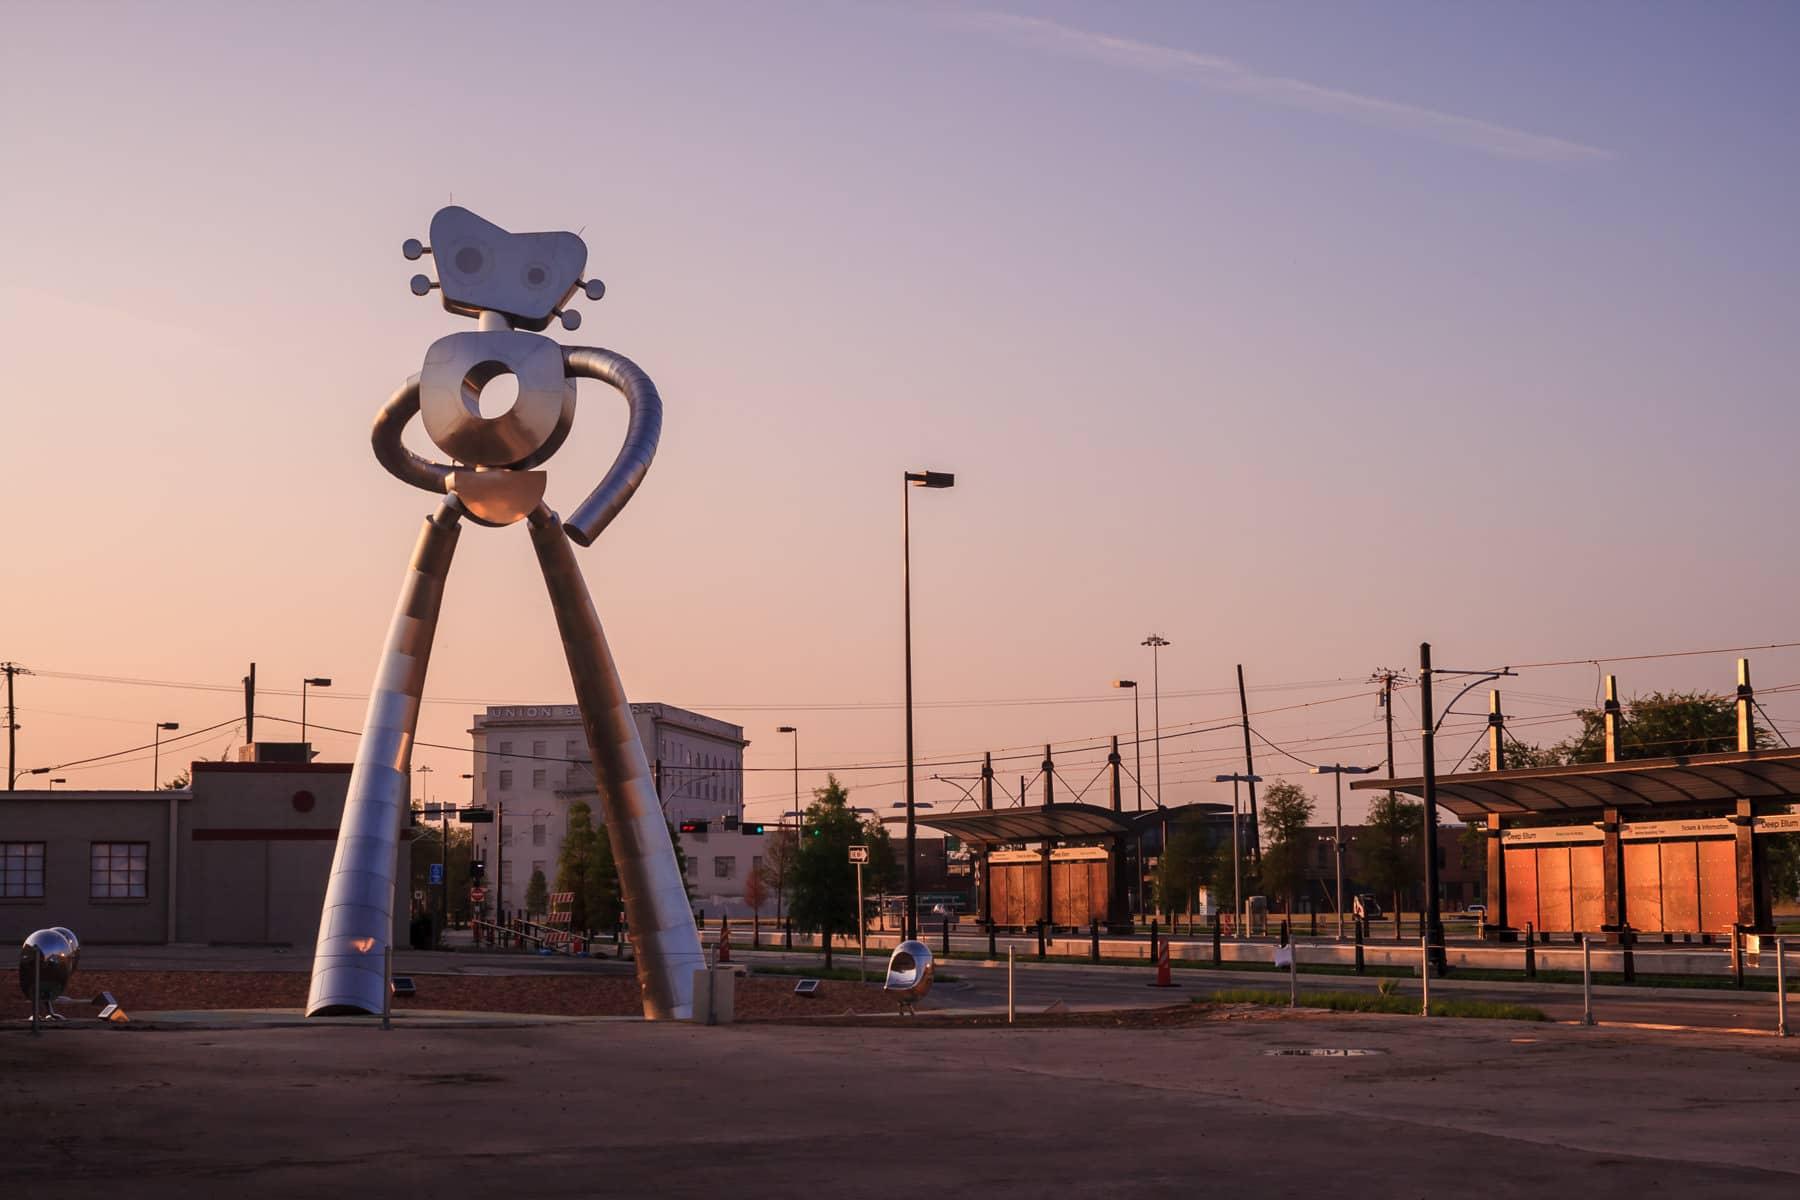 The dawn's sun lights Dallas' Traveling Man sculpture in Deep Ellum.